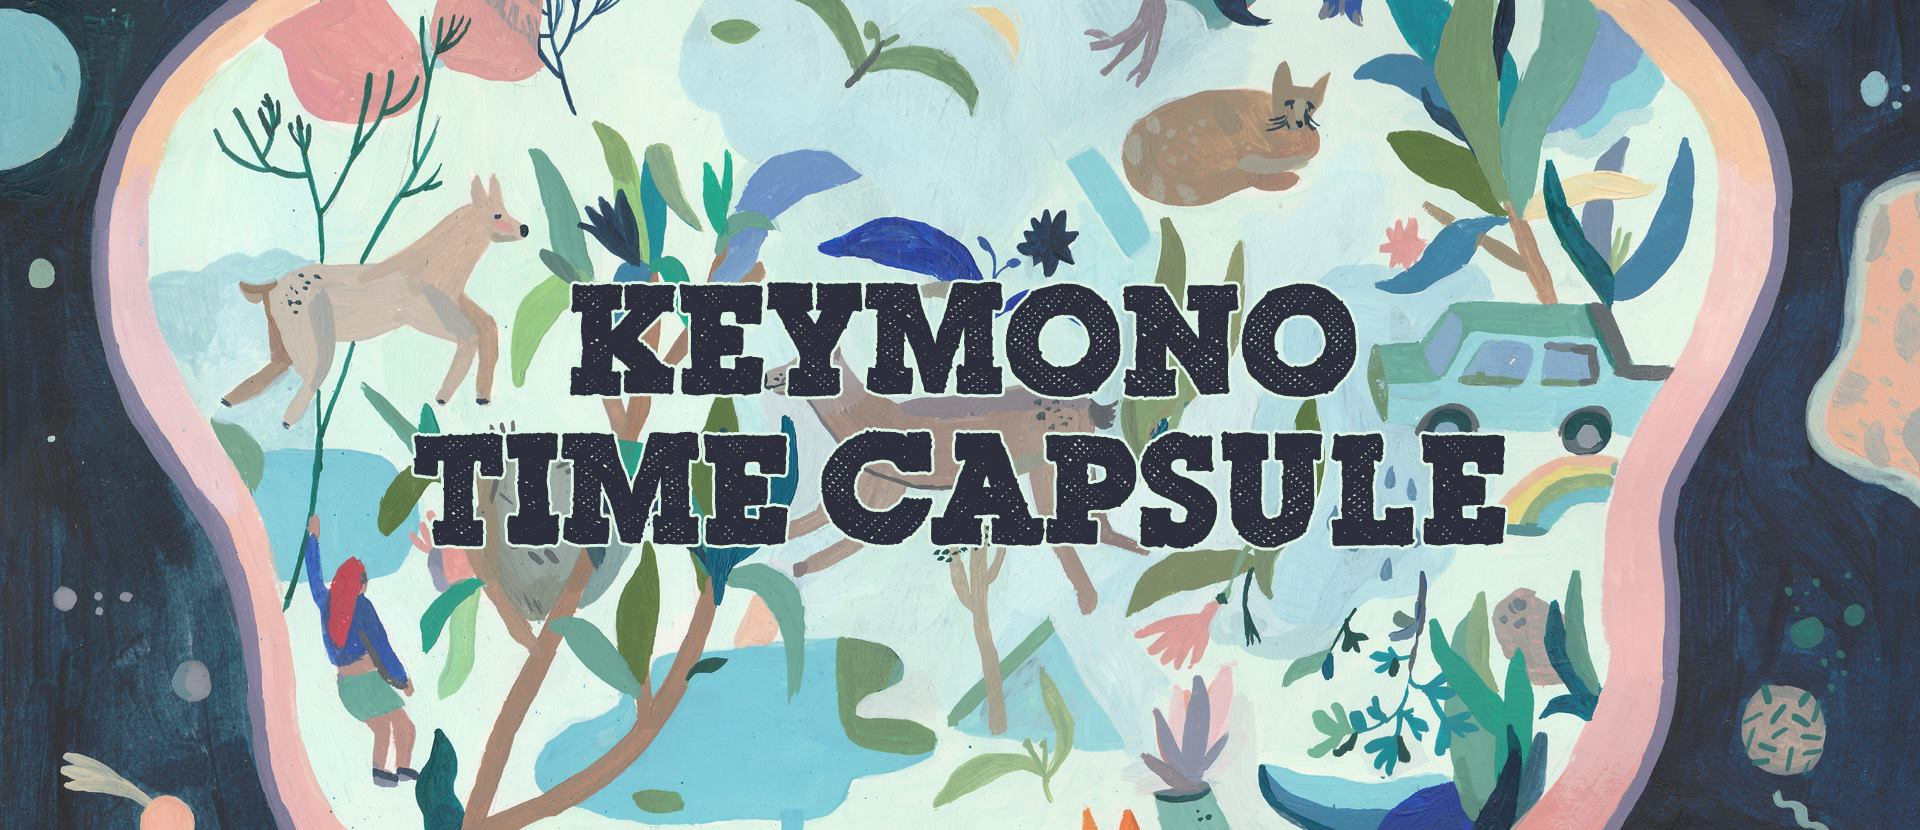 Keymono | Time Capsule